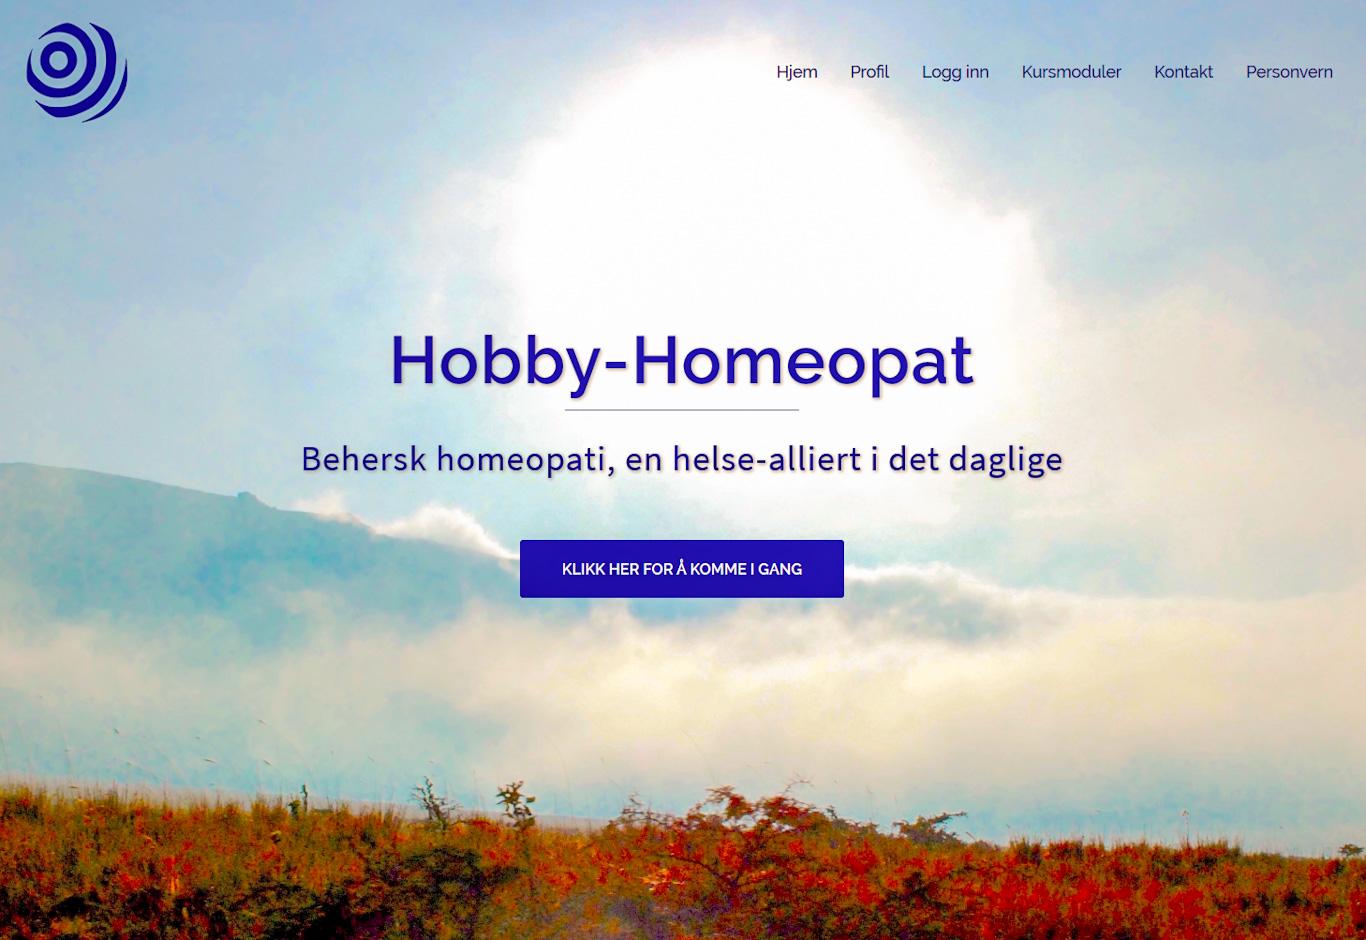 Hobby-Homeopat